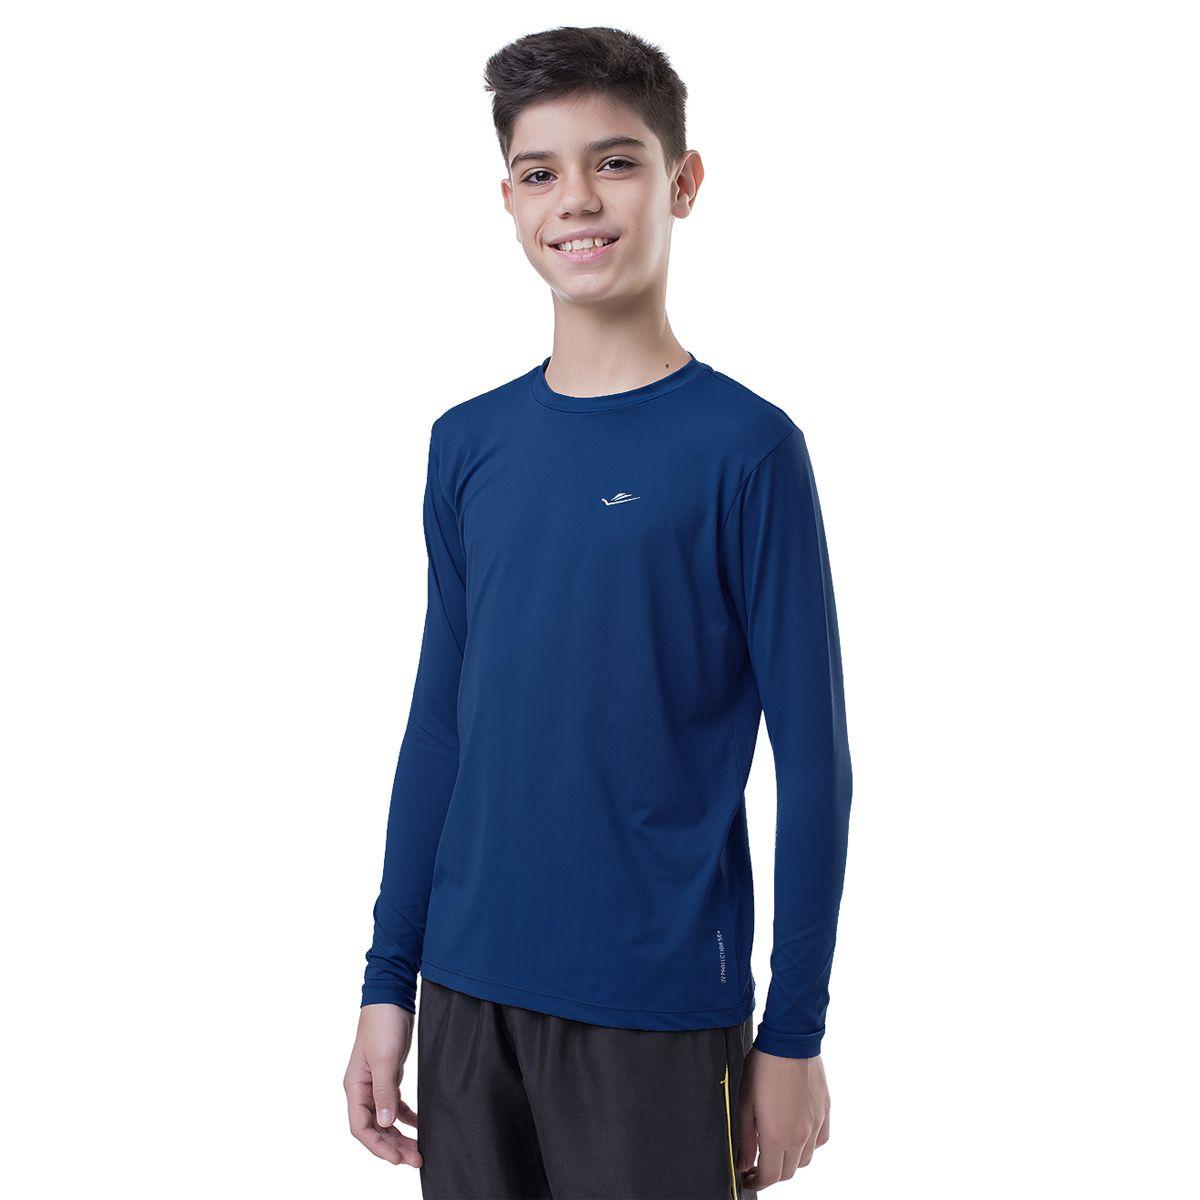 Camiseta Térmica Infantil Marinho Elite UPF 50+